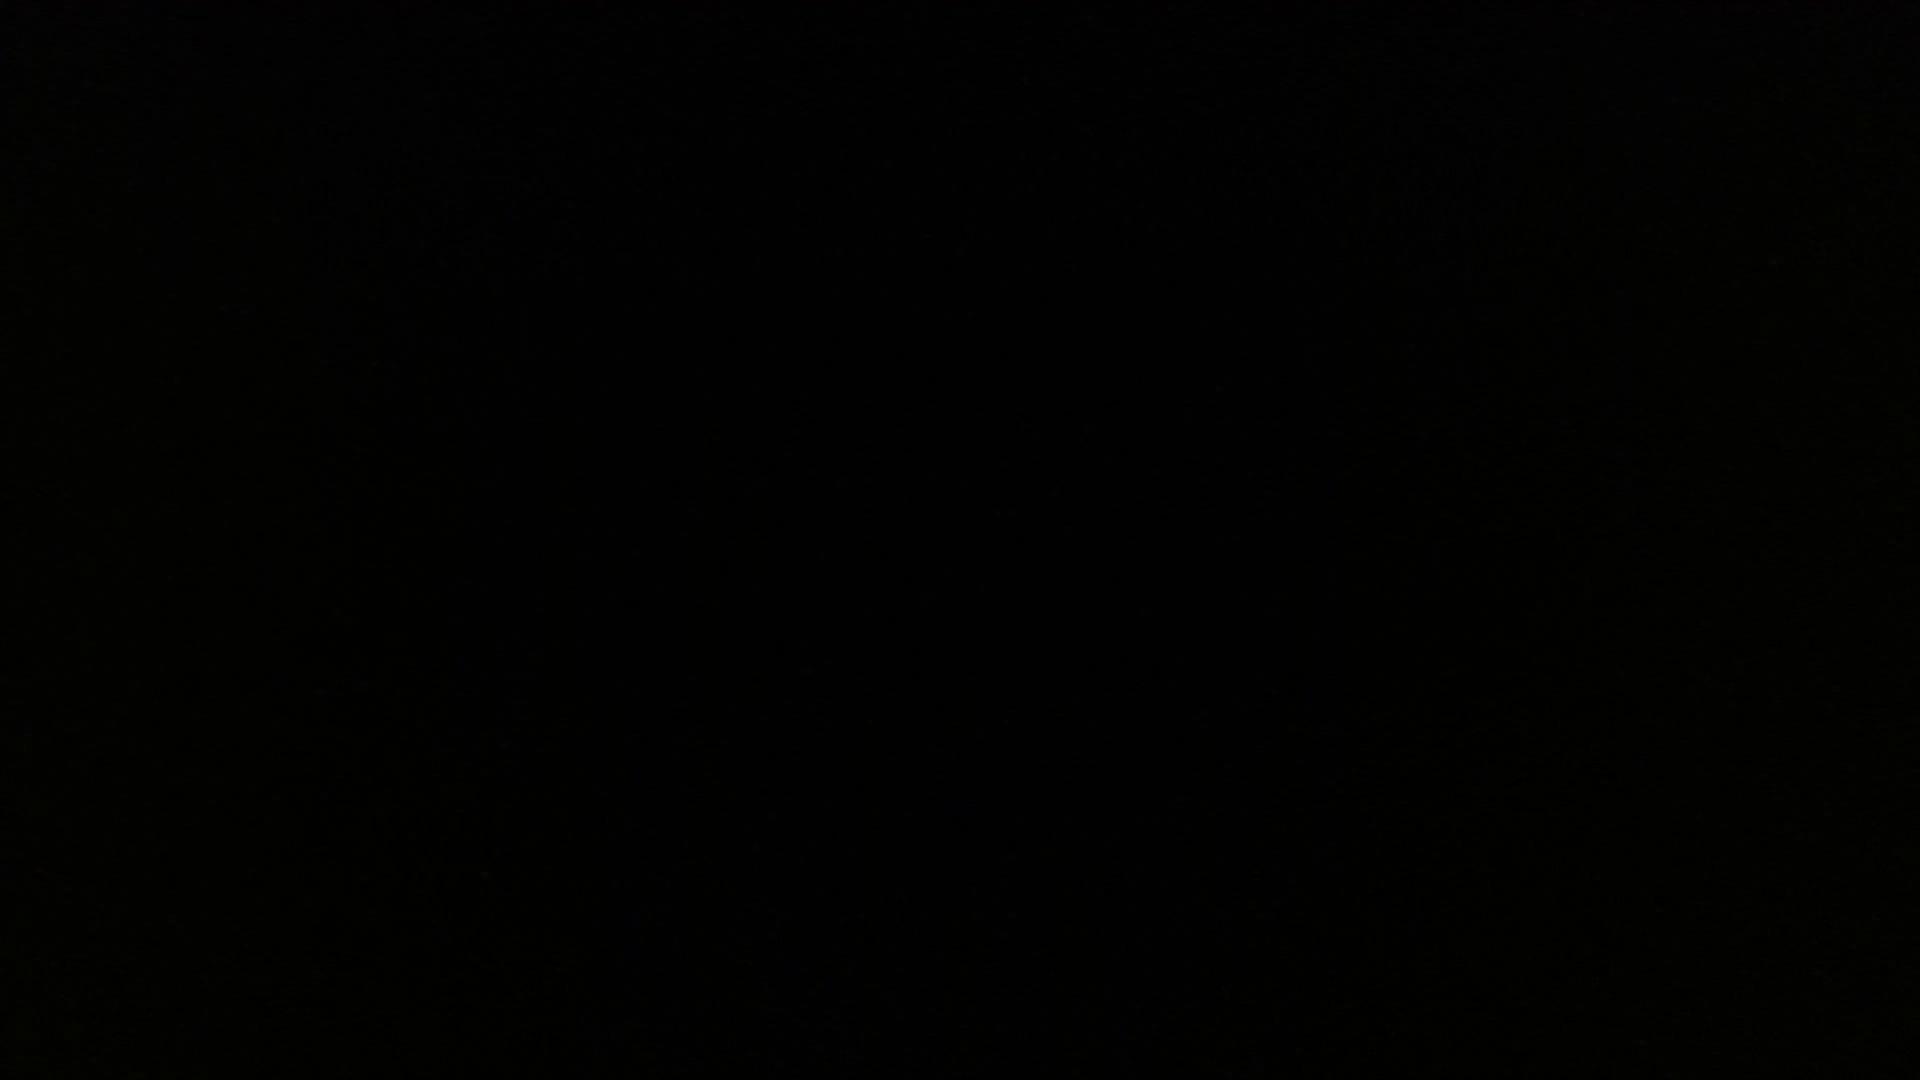 SPYさん初投稿!マンション覗き!5000K!ハイビジョン撮影VOL.03(元野球部社会人編) ノンケ ペニス画像 11画像 5